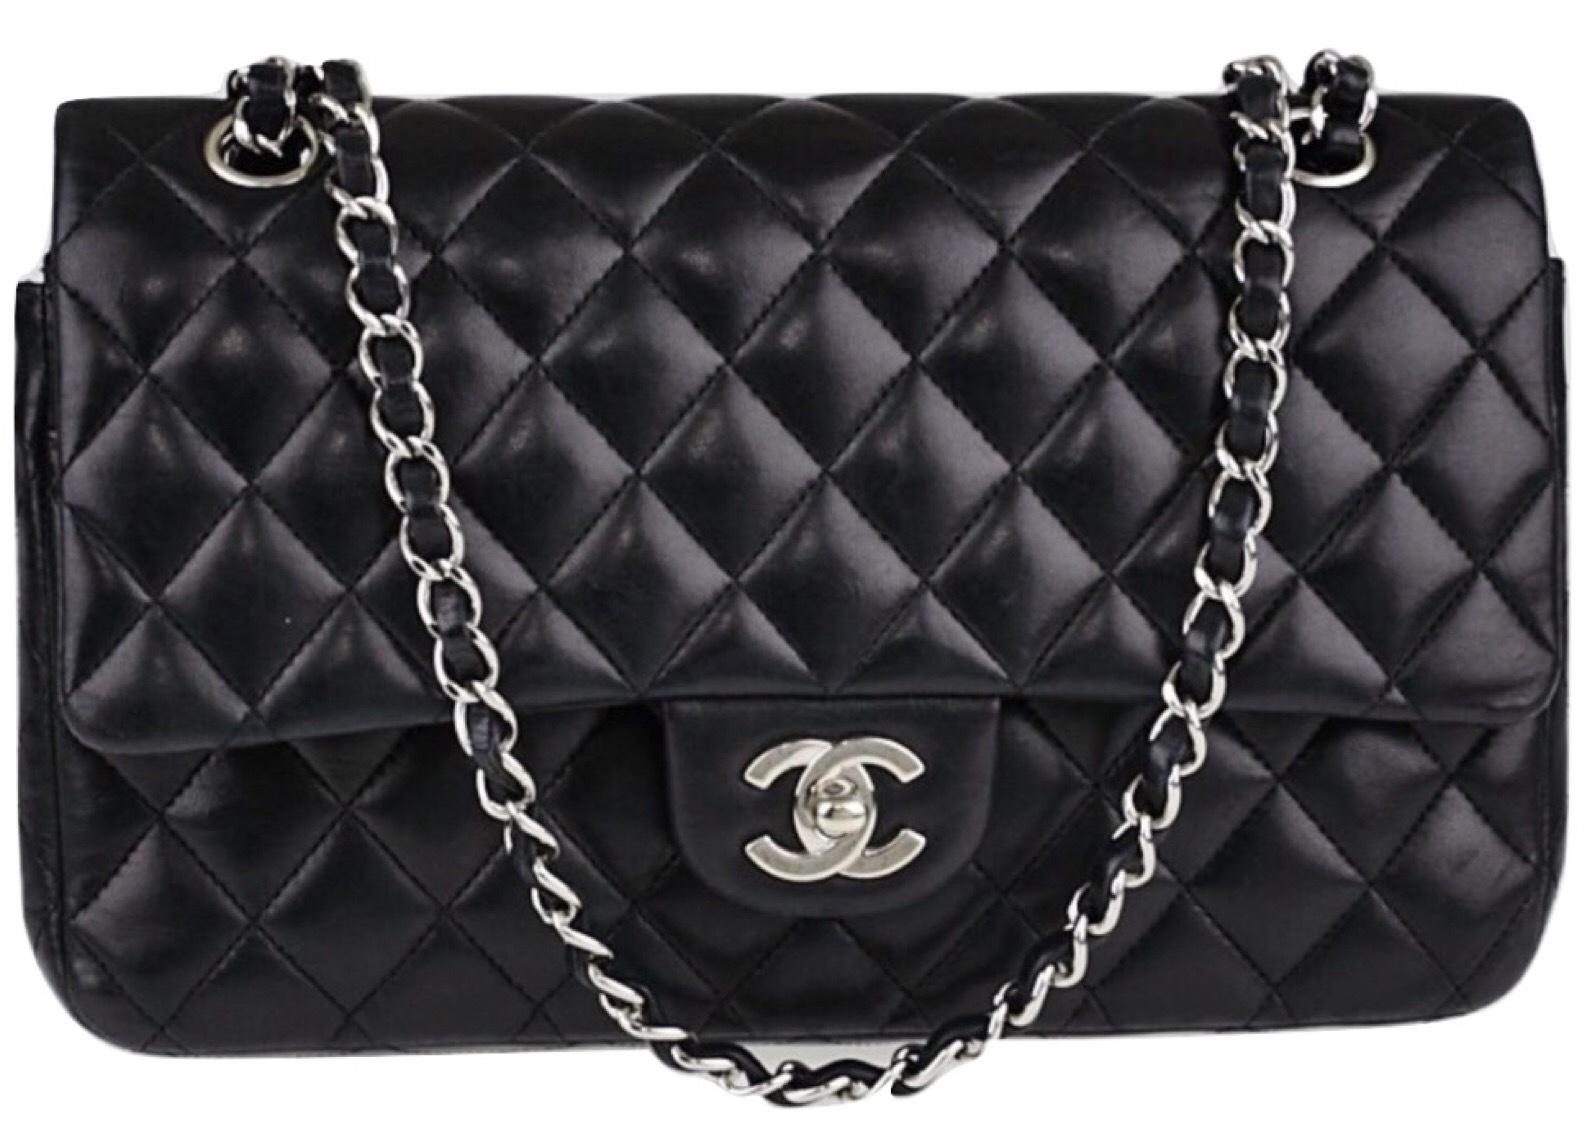 0923edfb07001d Authentic Chanel Black Medium Lambskin Double Flap Bag Shw Handbags.  Authentic Chanel Purse Best Image Ccdbb